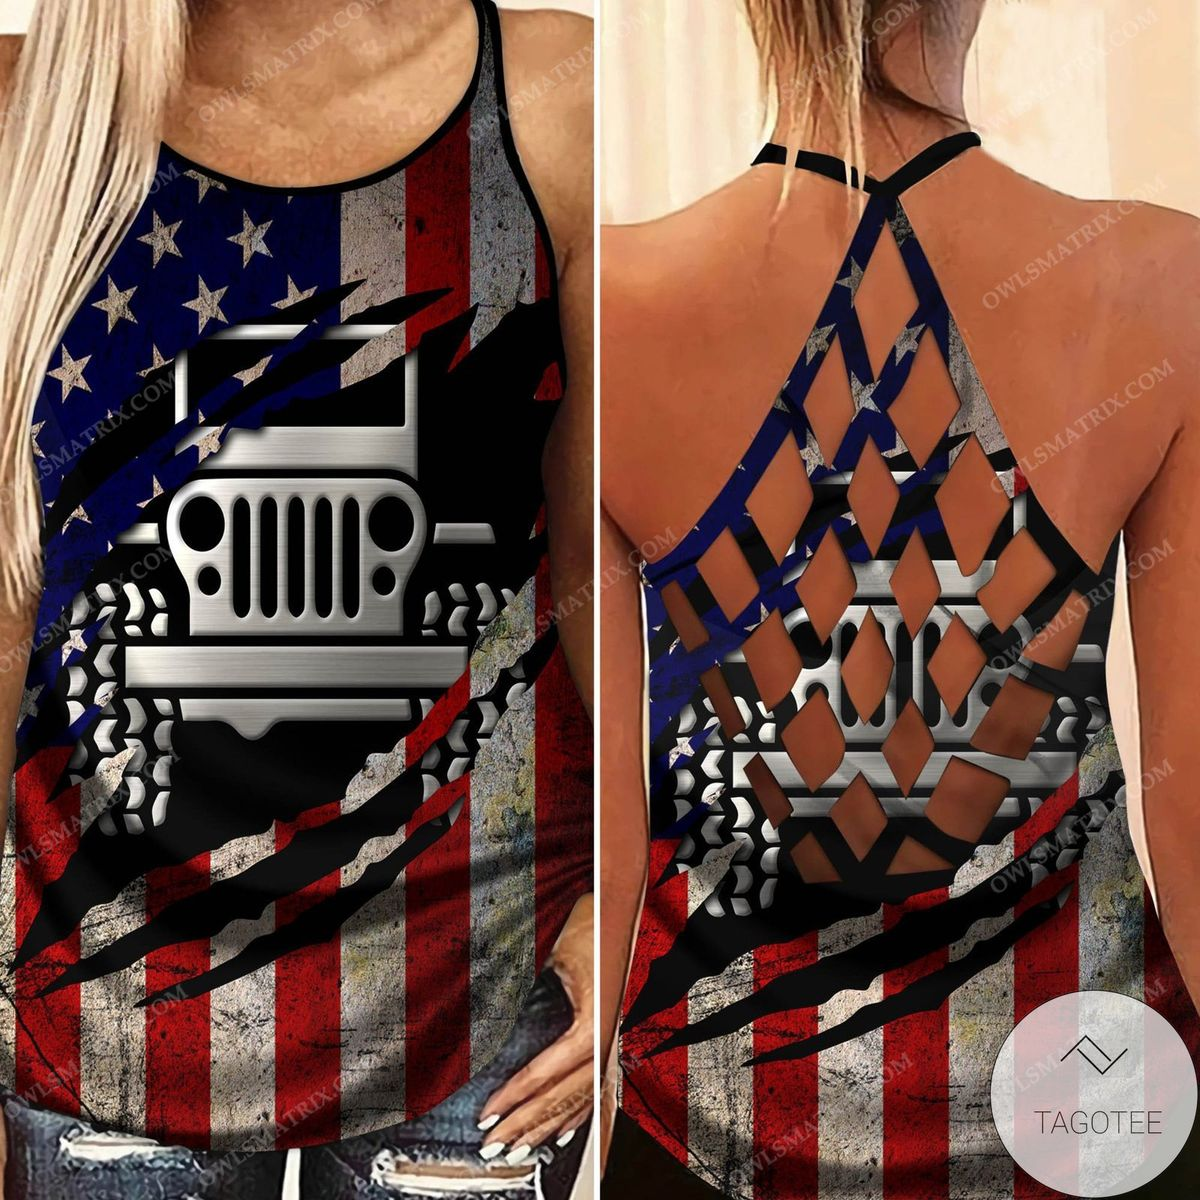 Jeep Girl Us Flag Criss Cross Tank Top